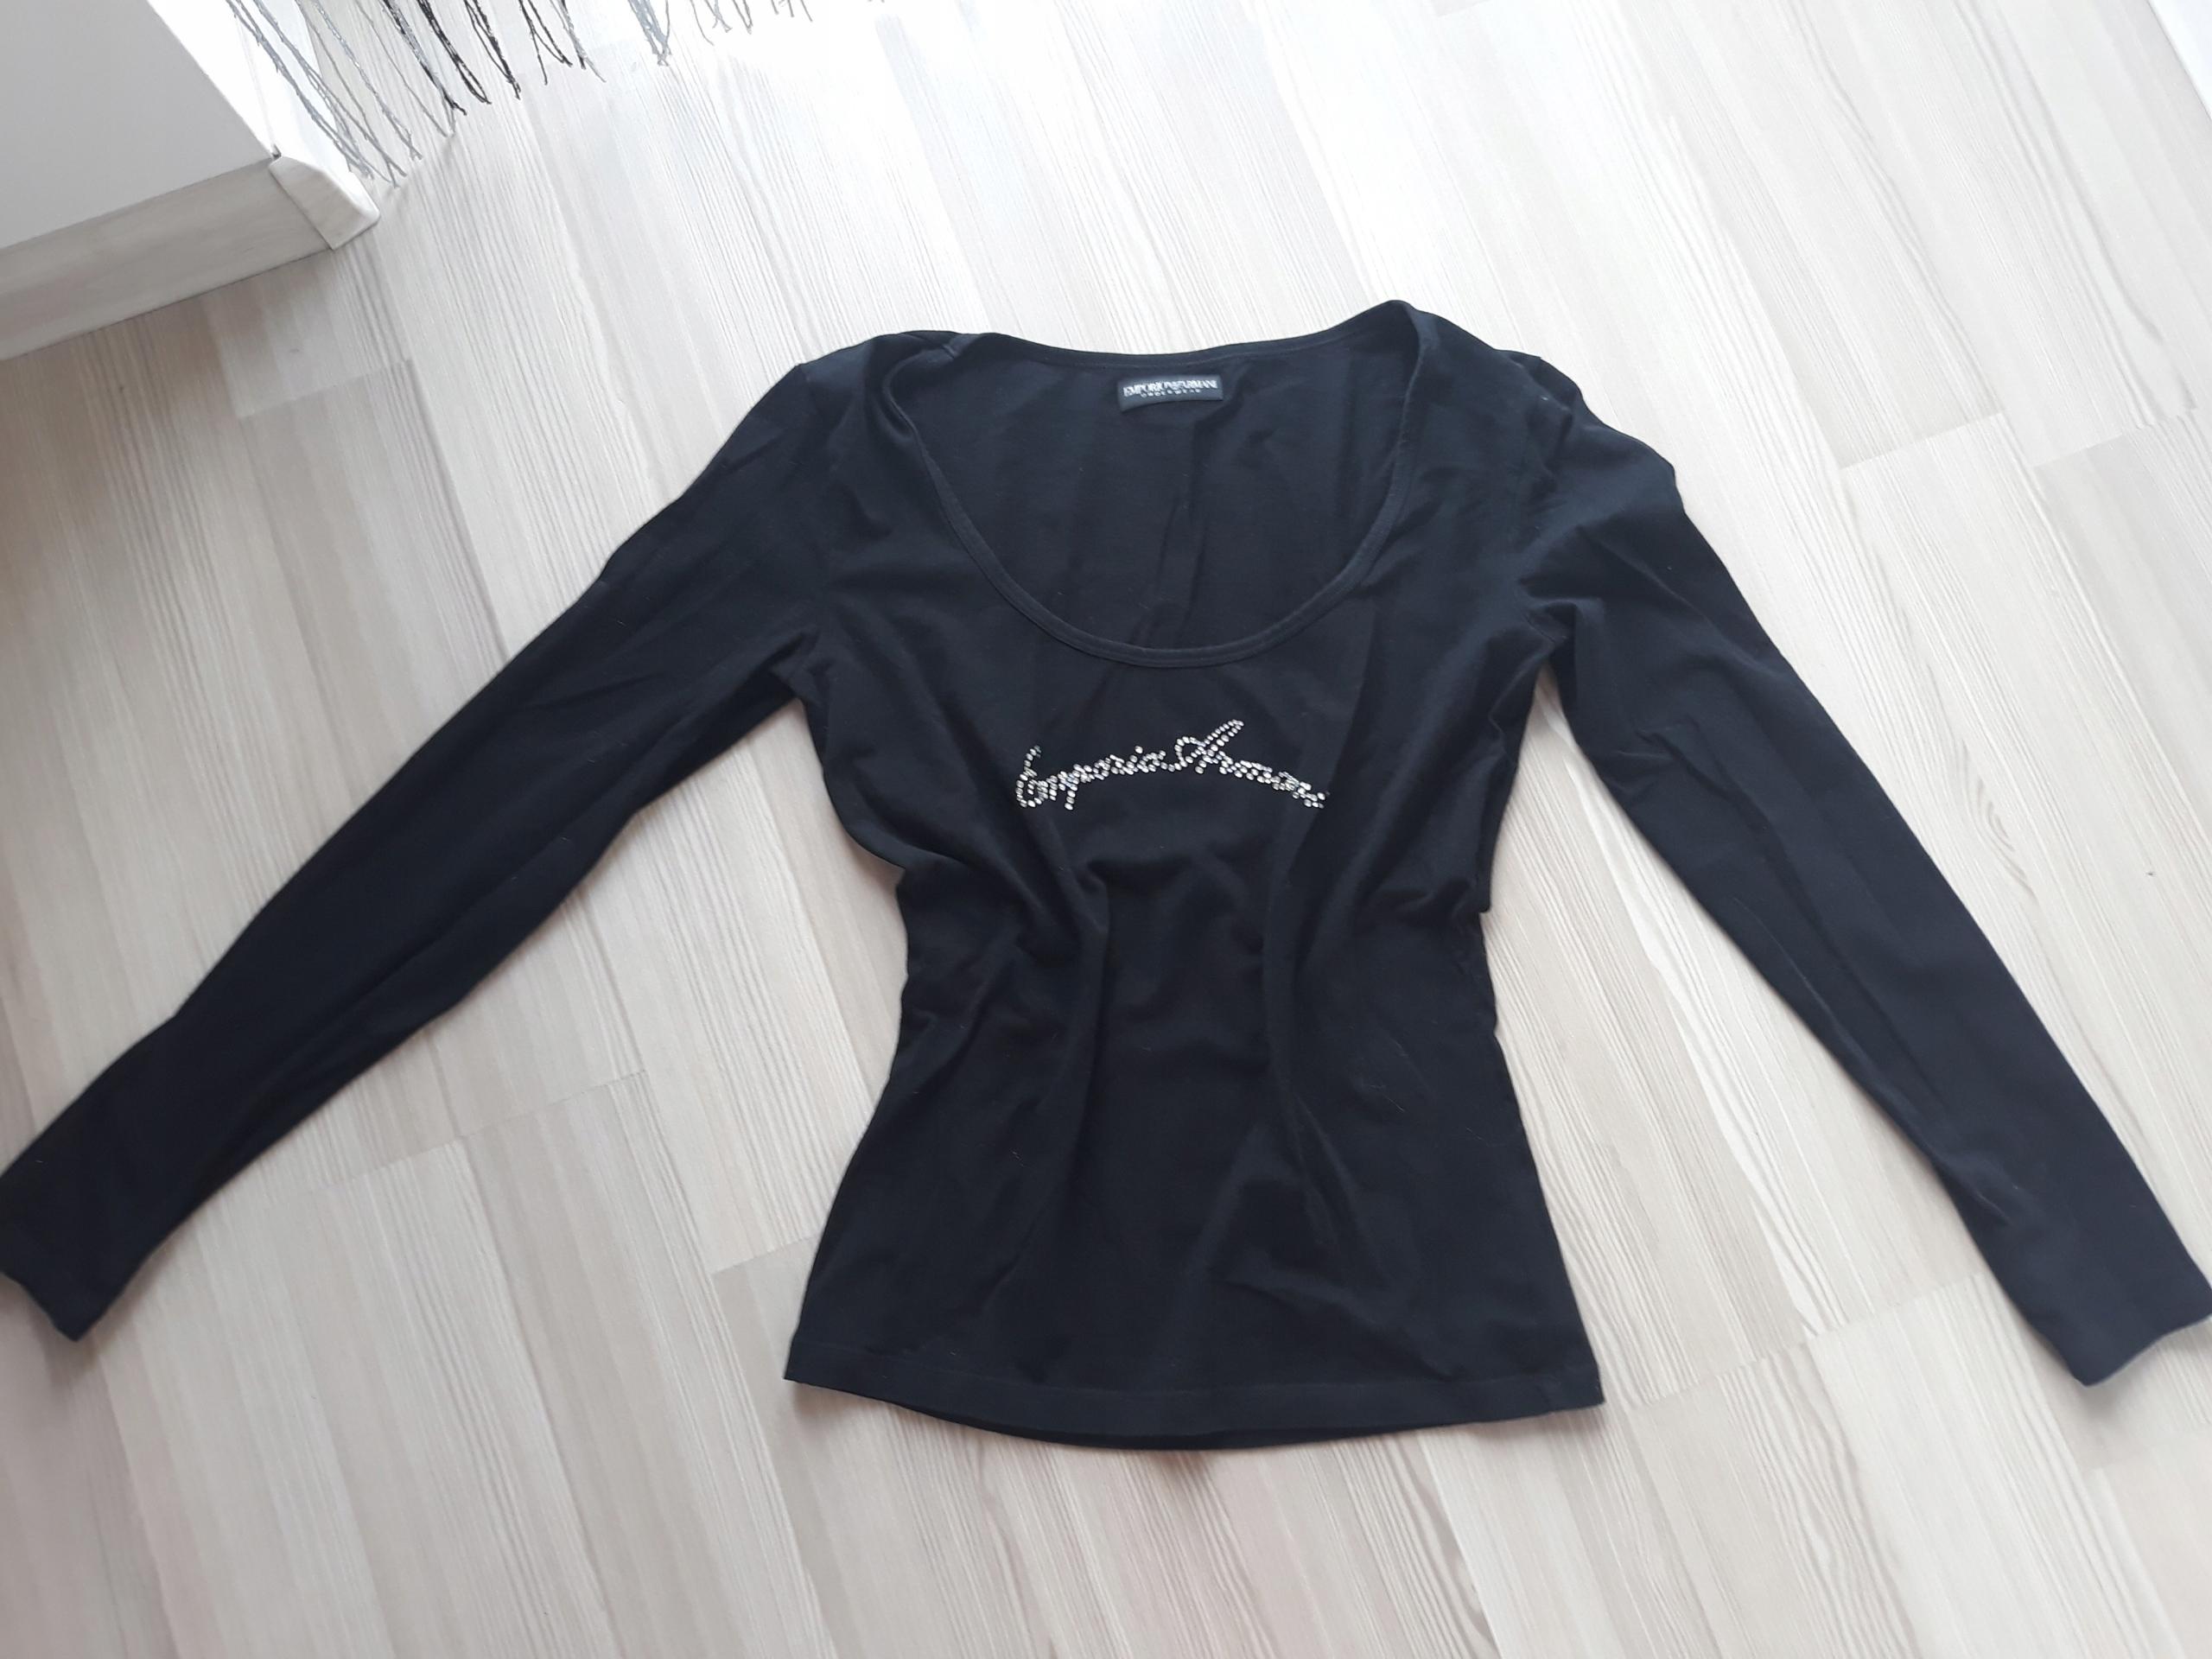 Czarna obcisła bluzka EMPORIO ARMANI cyrkonie M/L